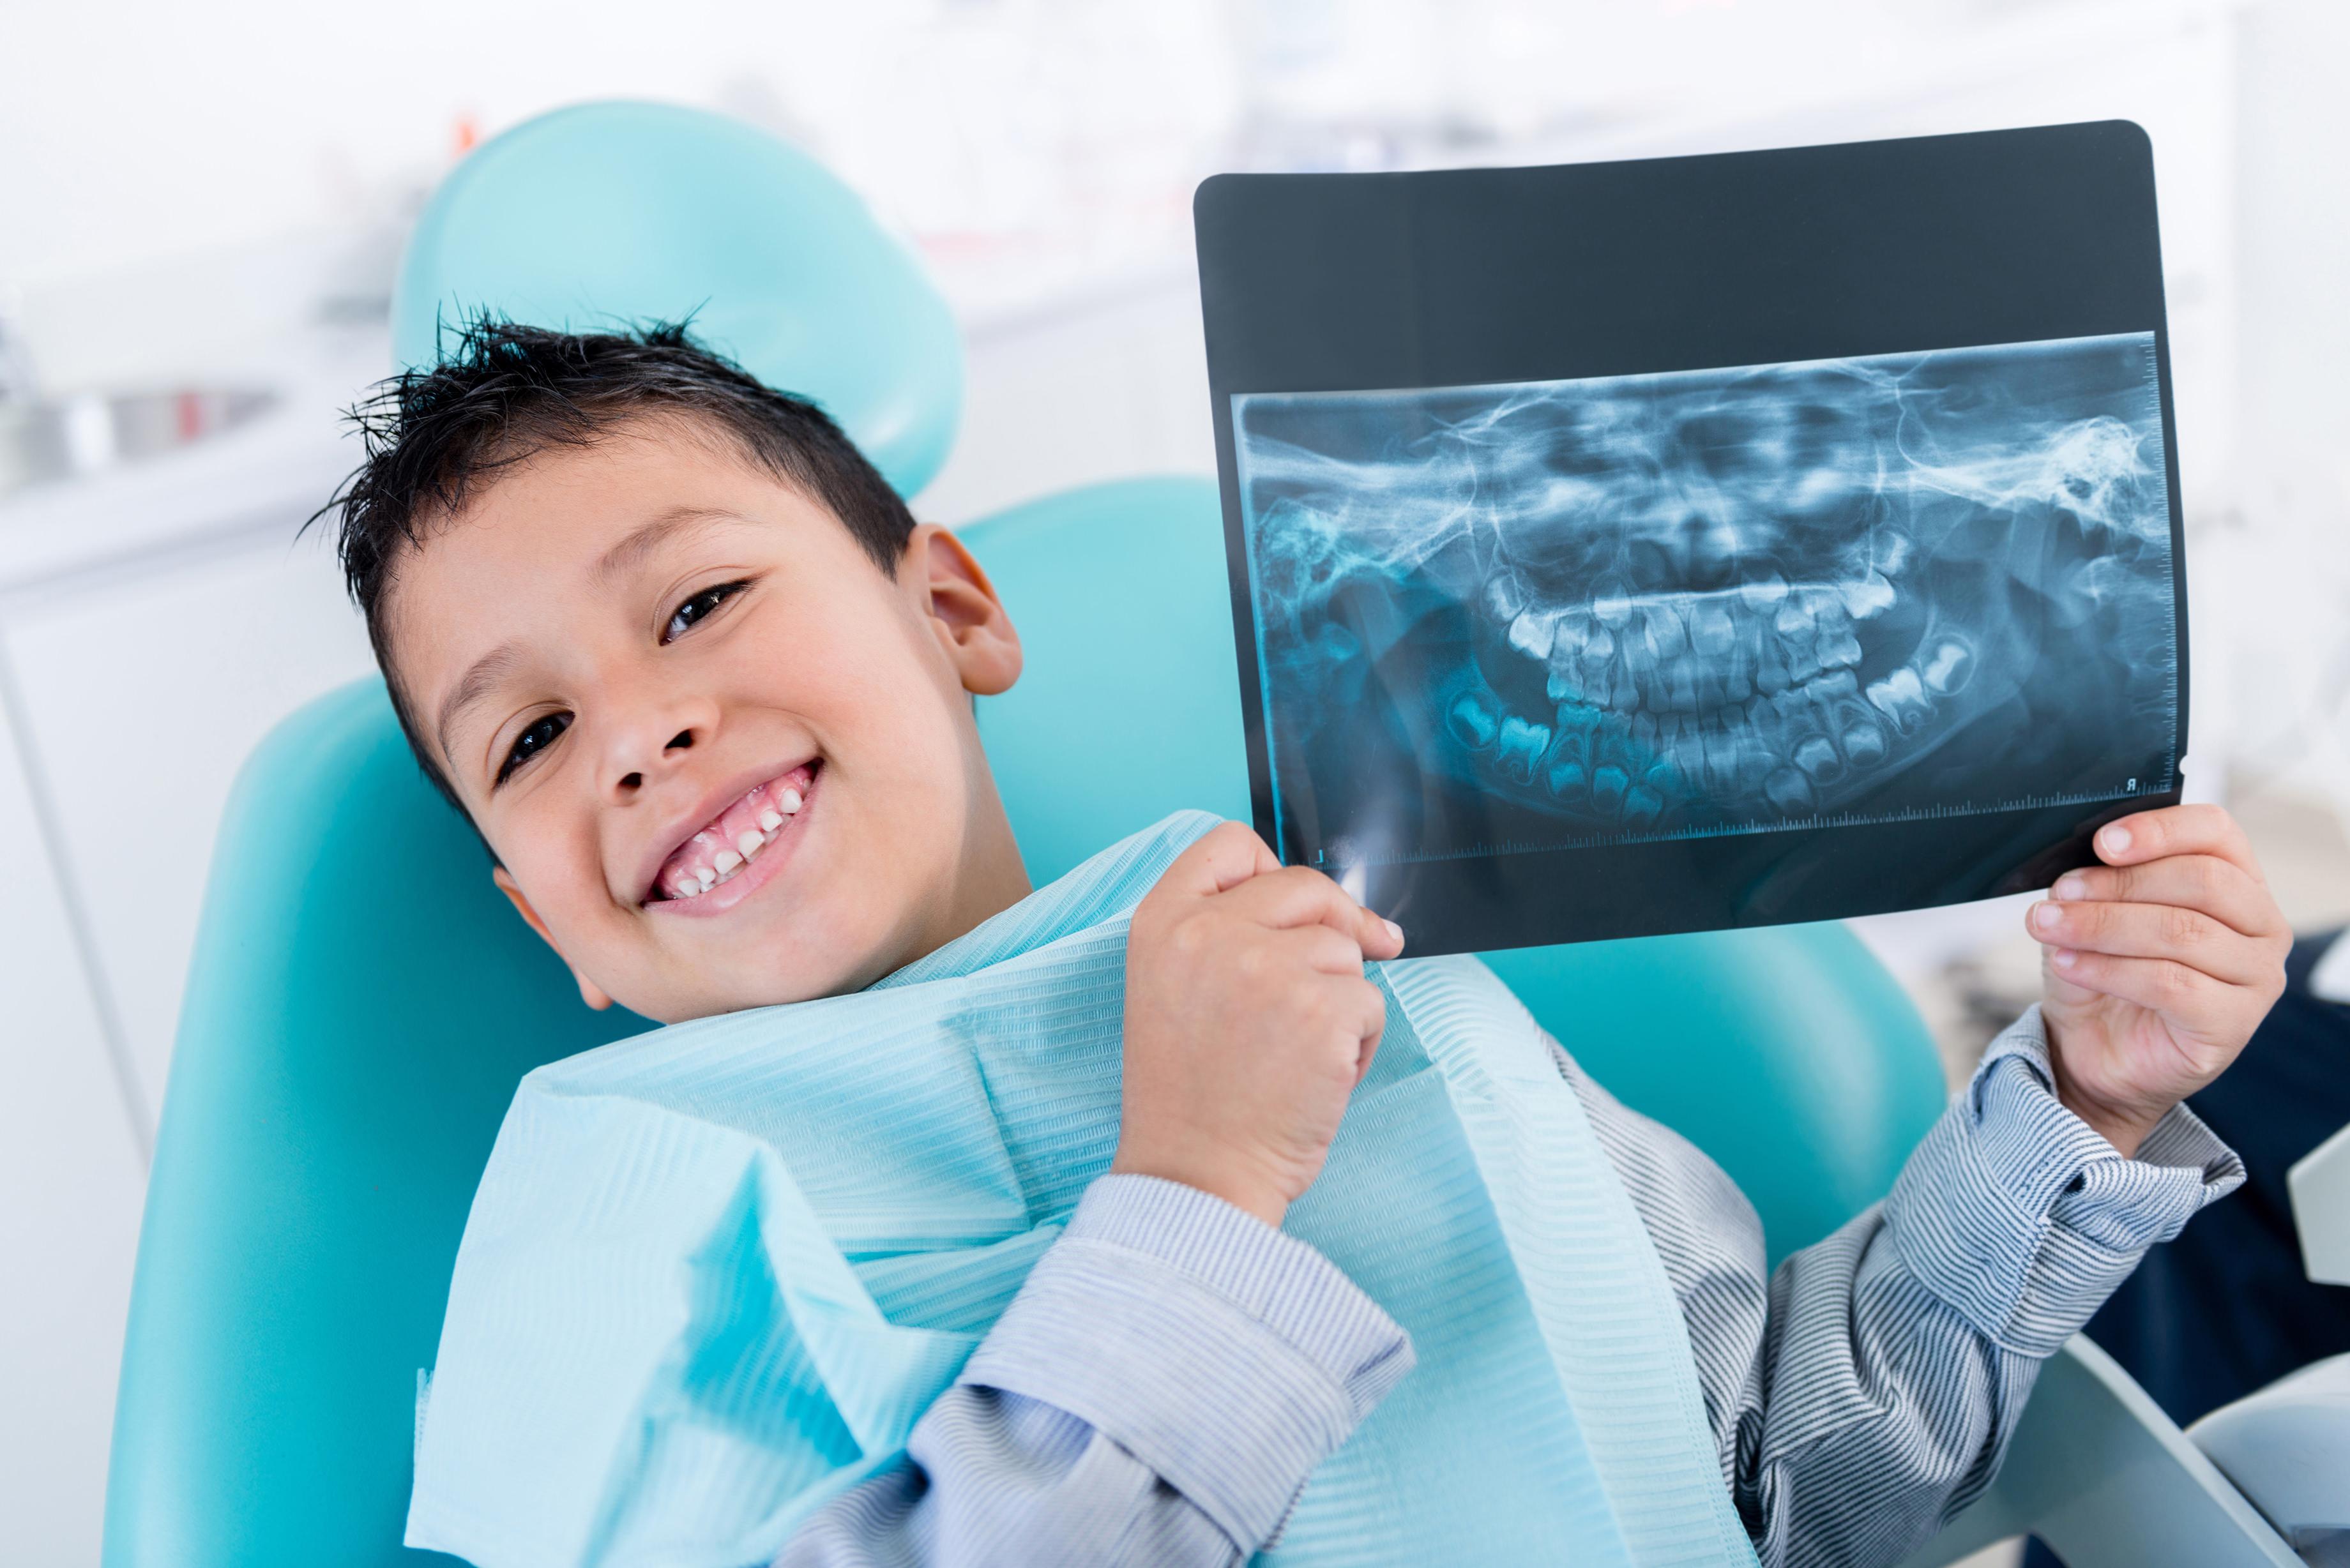 pediatric dentist kids care